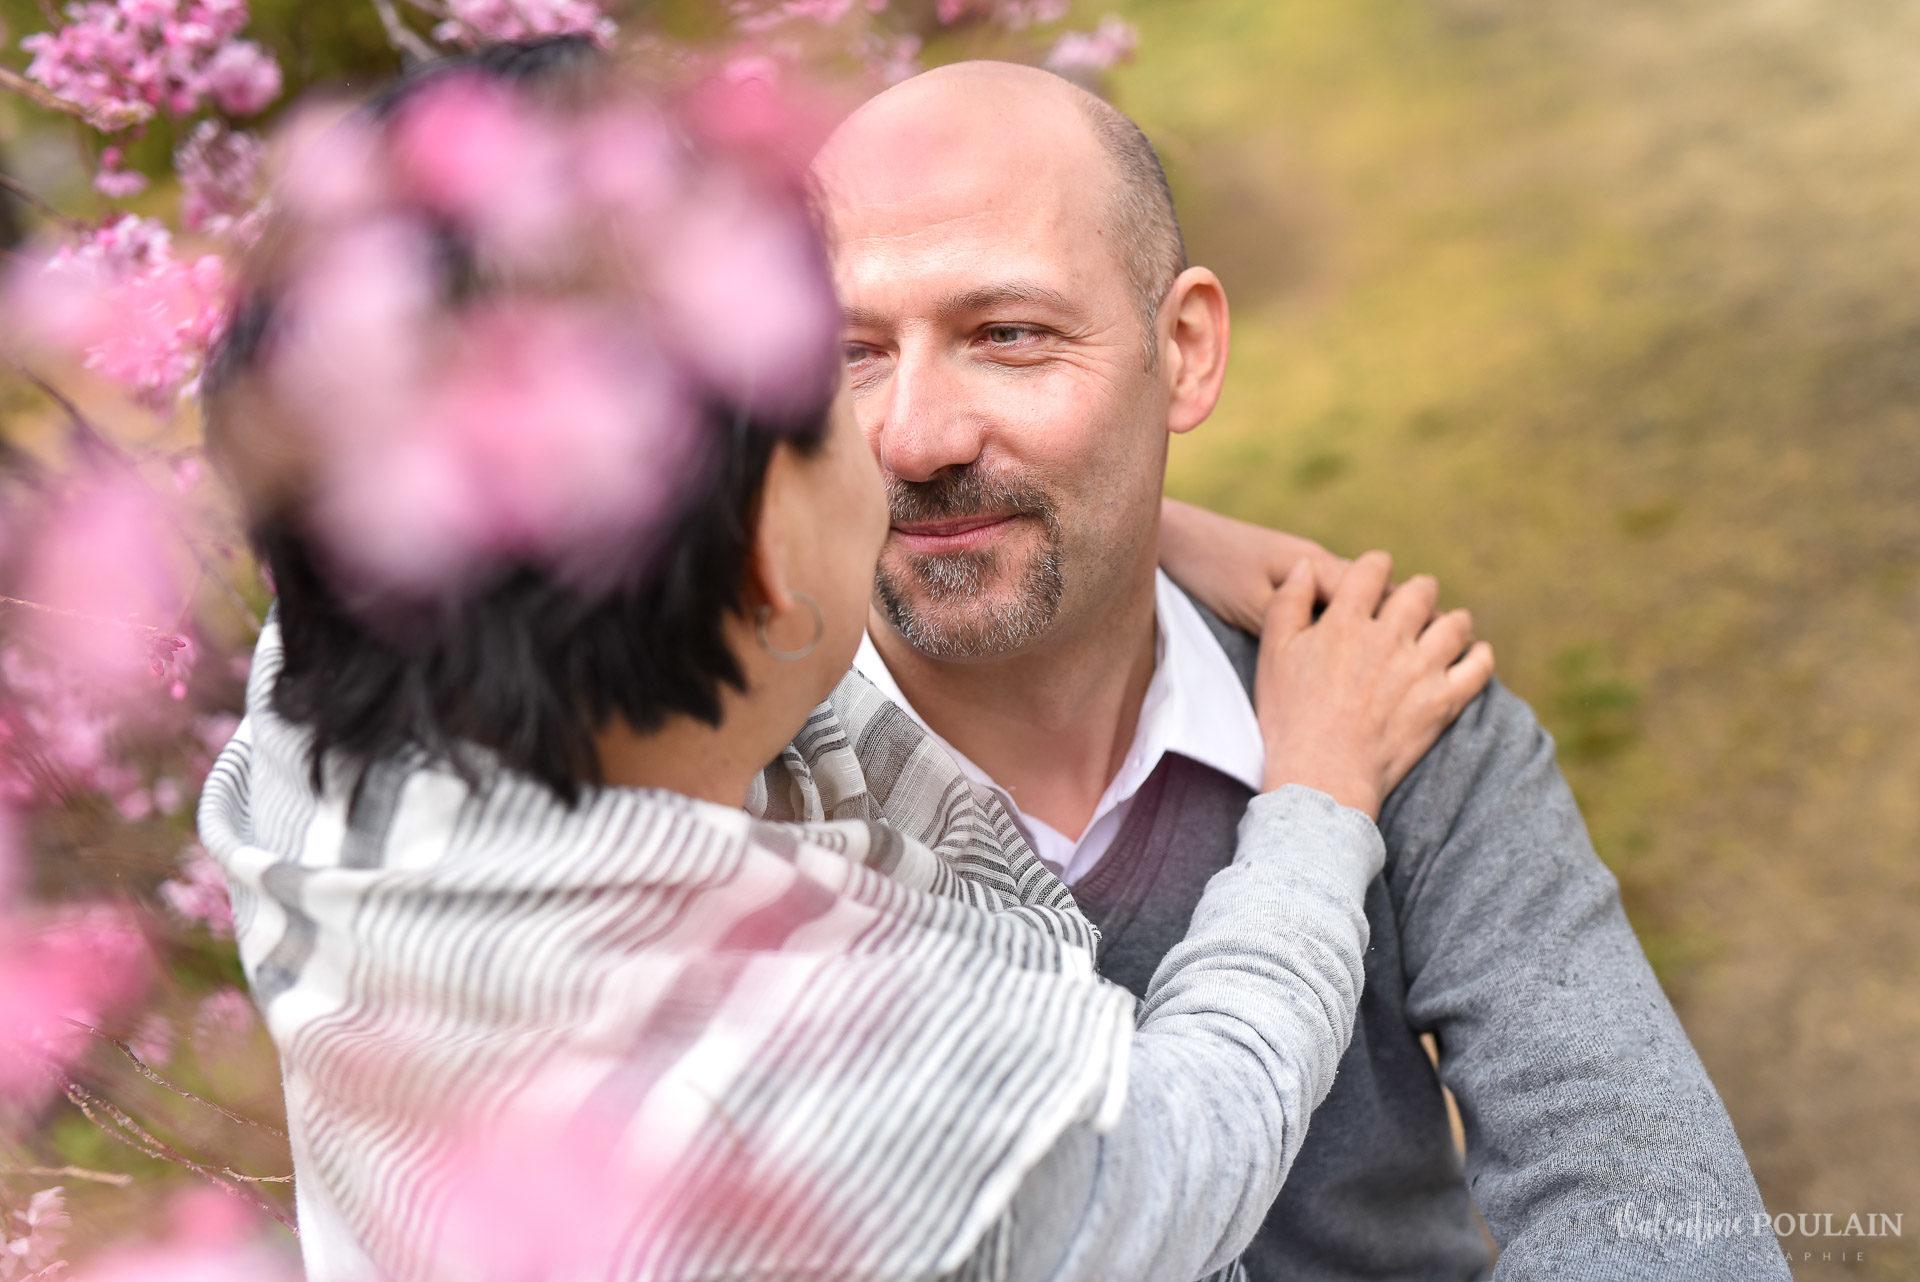 Shooting Couple Kyoto - Valentine Poulain lui